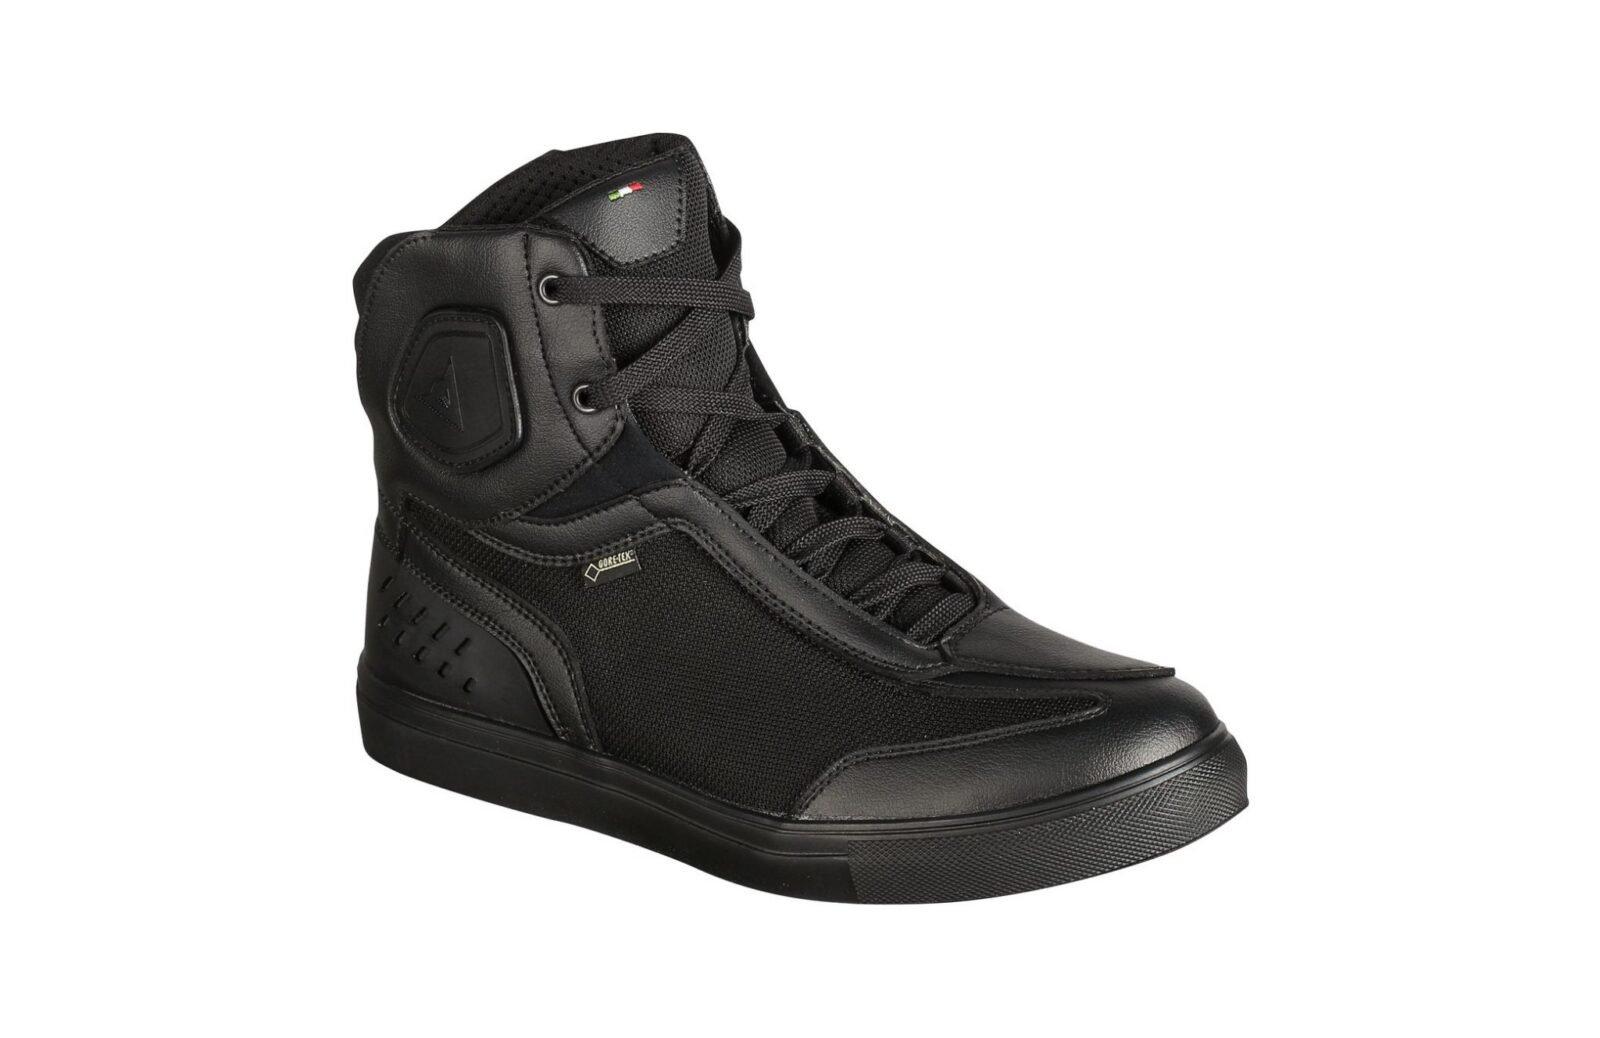 Dainese Street Darker Gore Tex Shoes 1600x1038 - Dainese Street Darker Gore-Tex Motorcycle Shoes